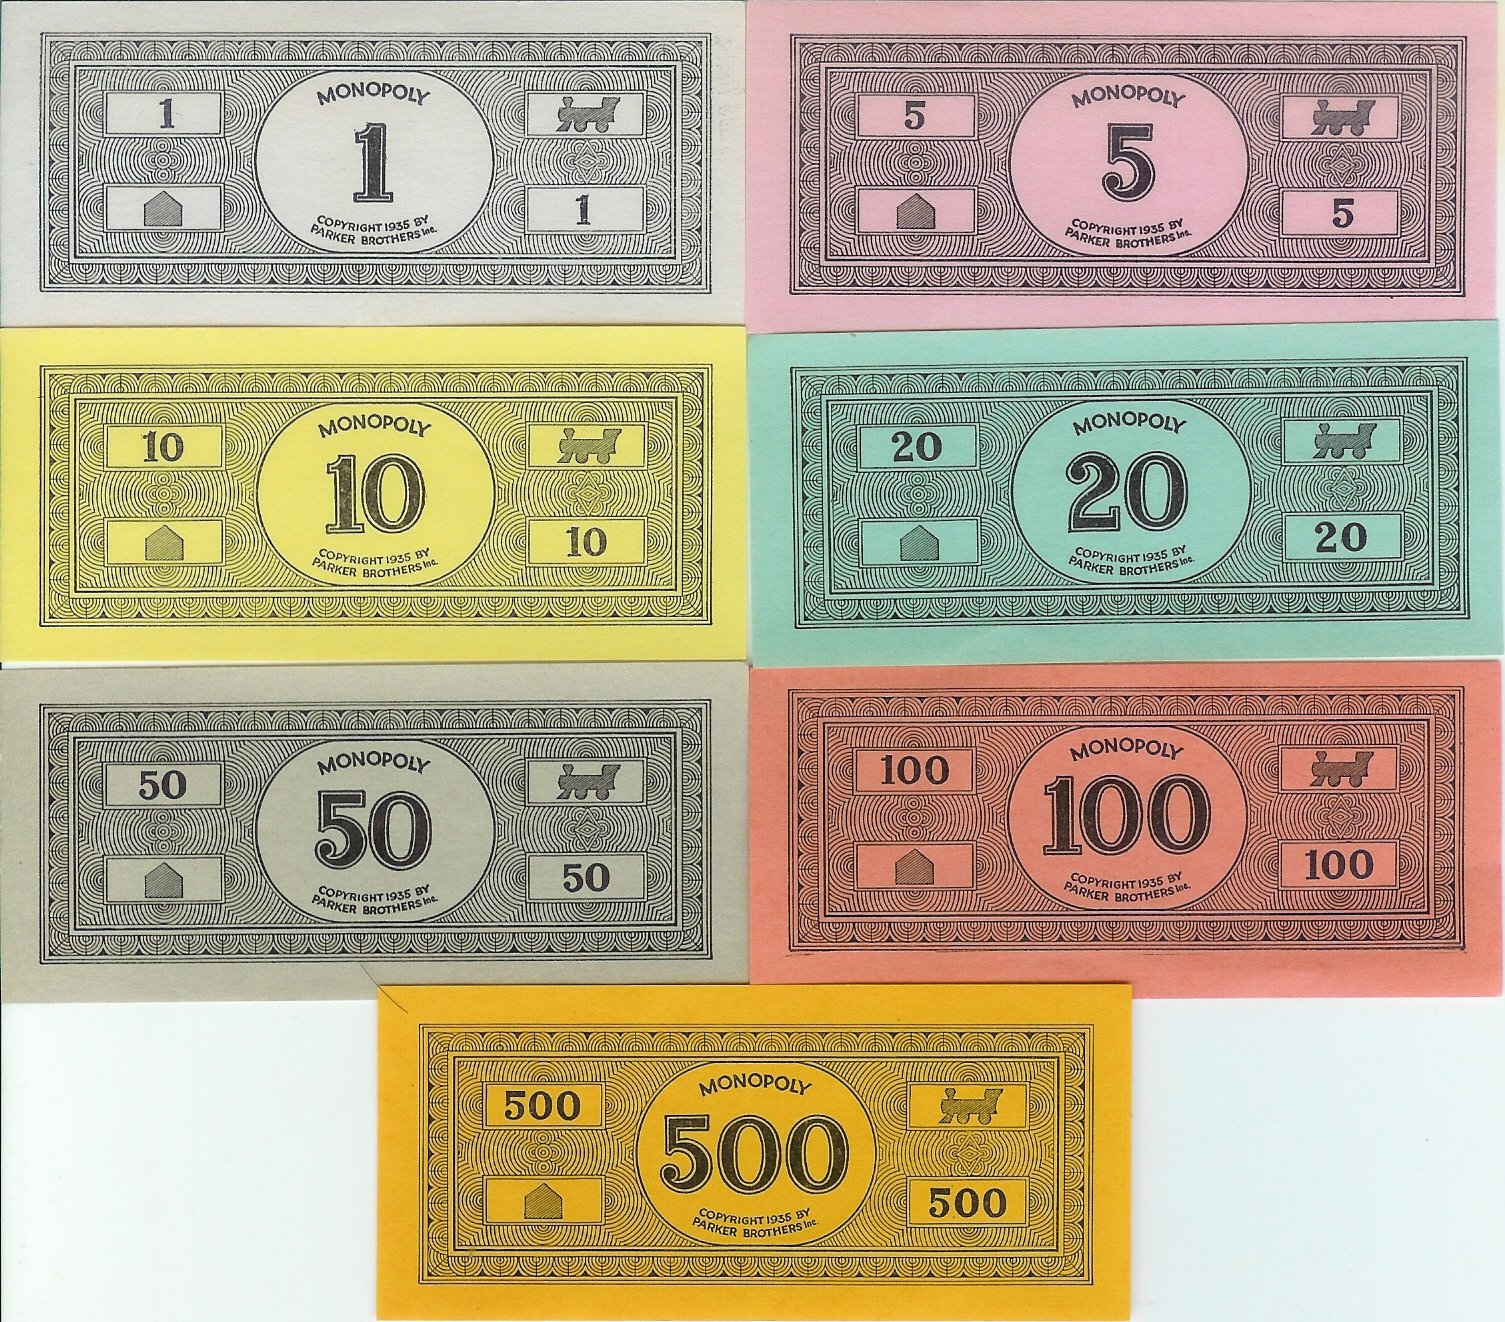 Editable Play Money Template Elegant Best S Of Monopoly Play Money Template Printable